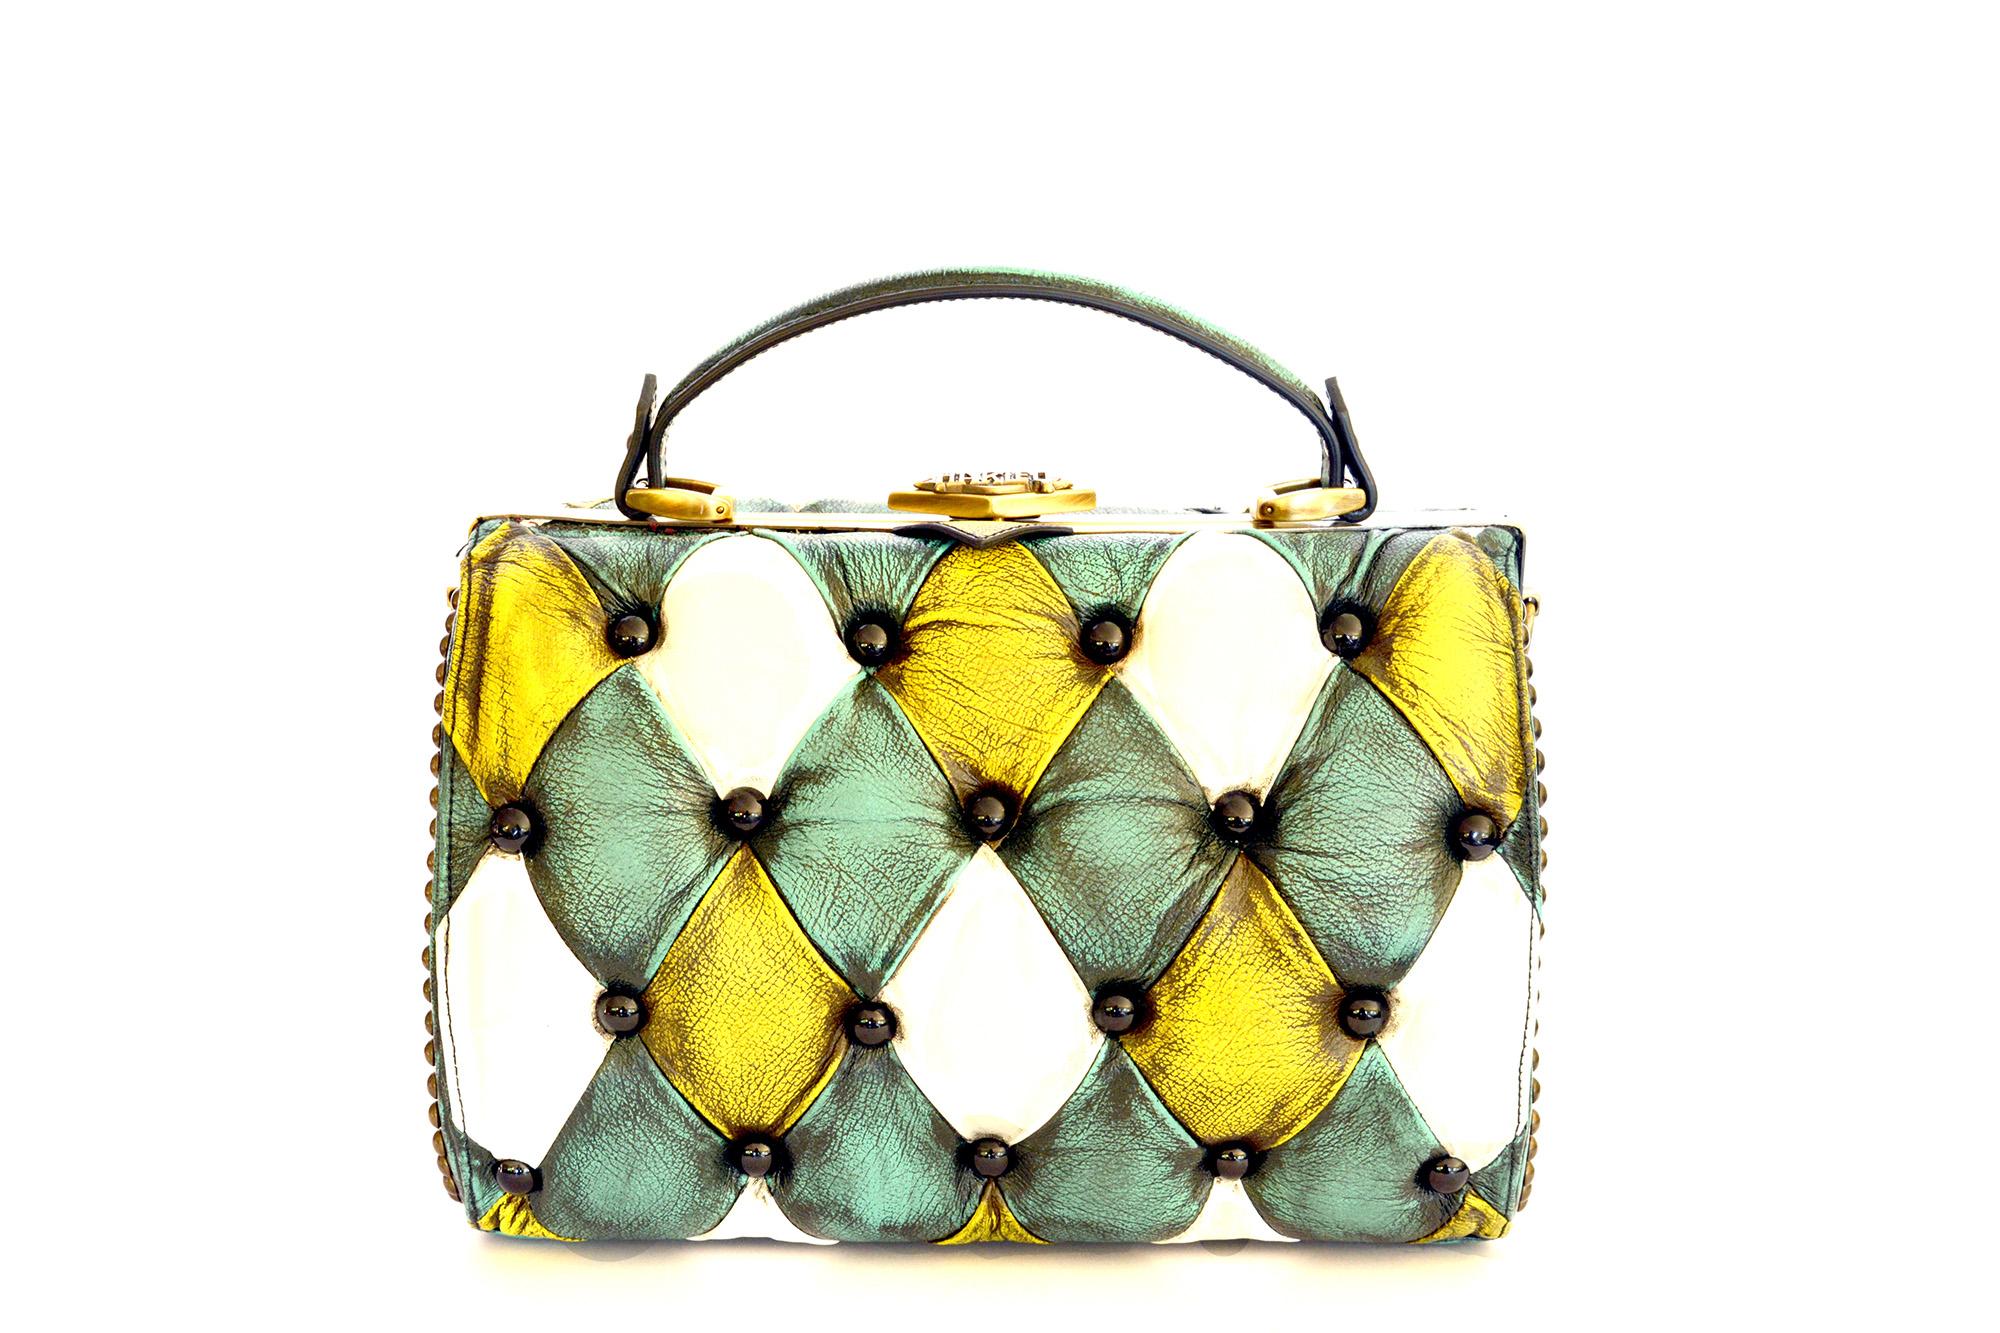 harleq-bag-turquoise-yellow-vintage-leathers